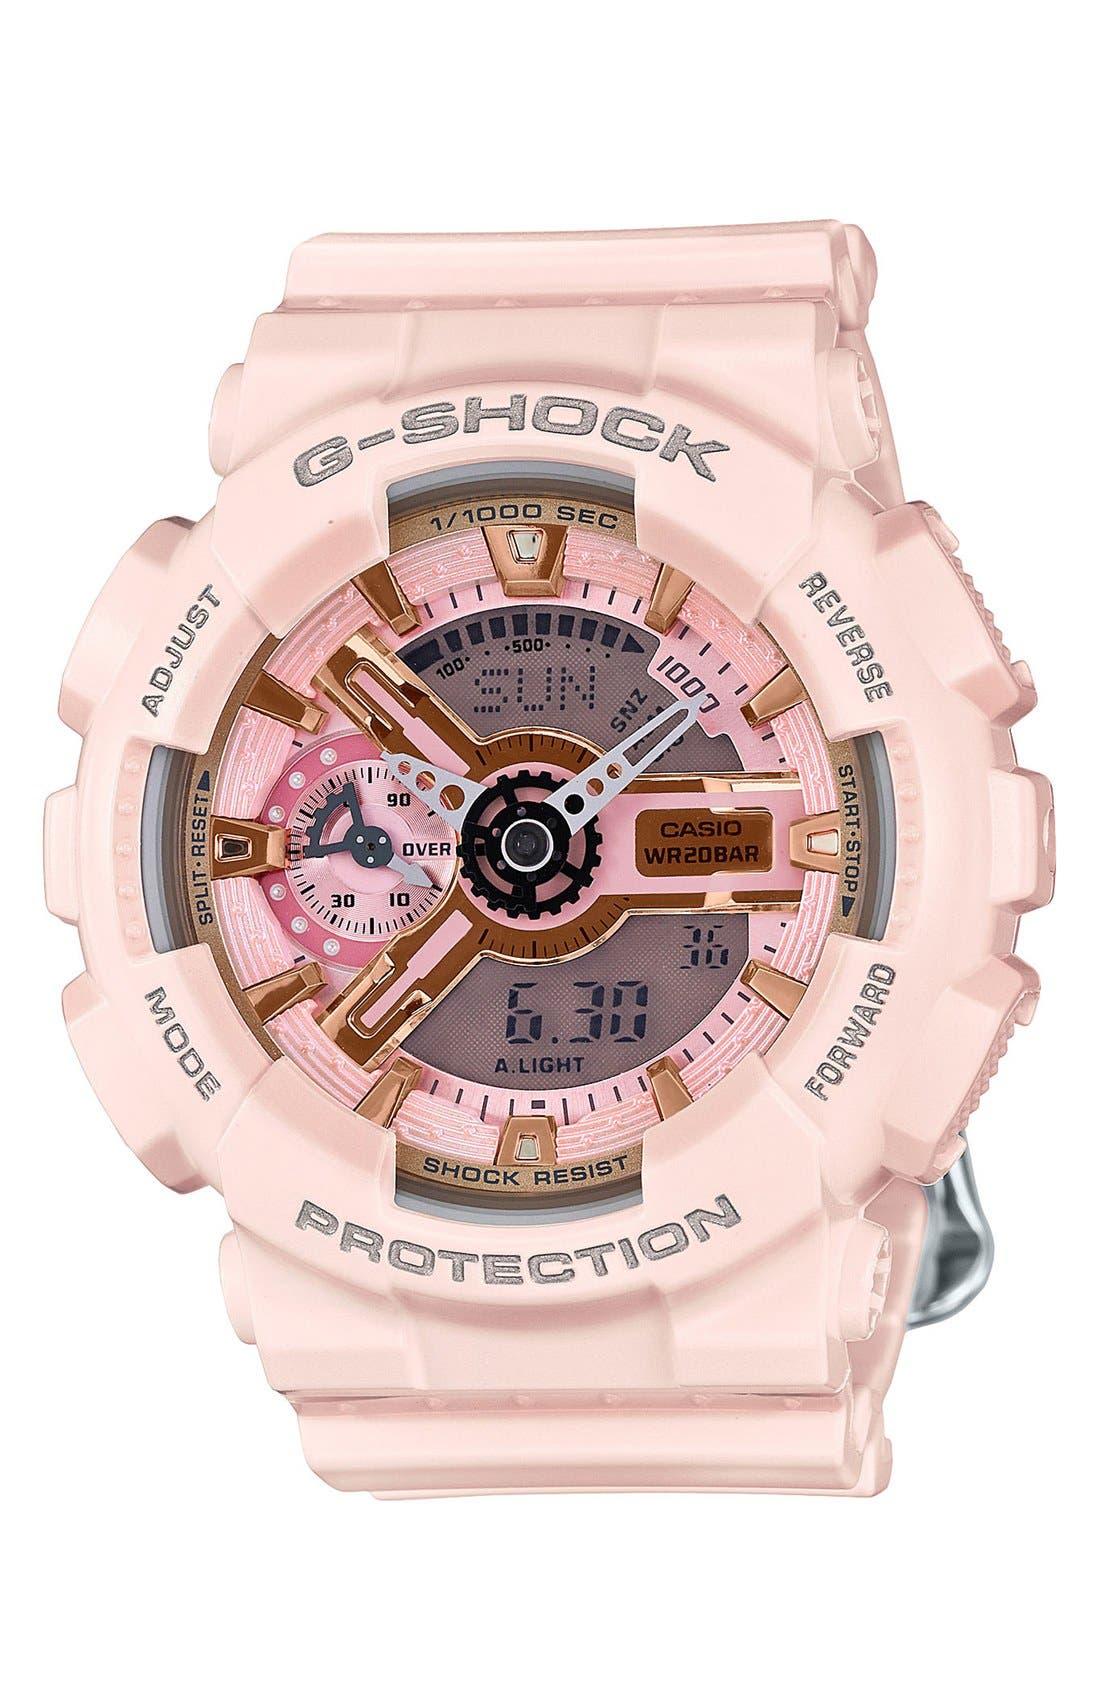 Main Image - G-Shock 'Ana-Digi' Resin Watch, 49mm